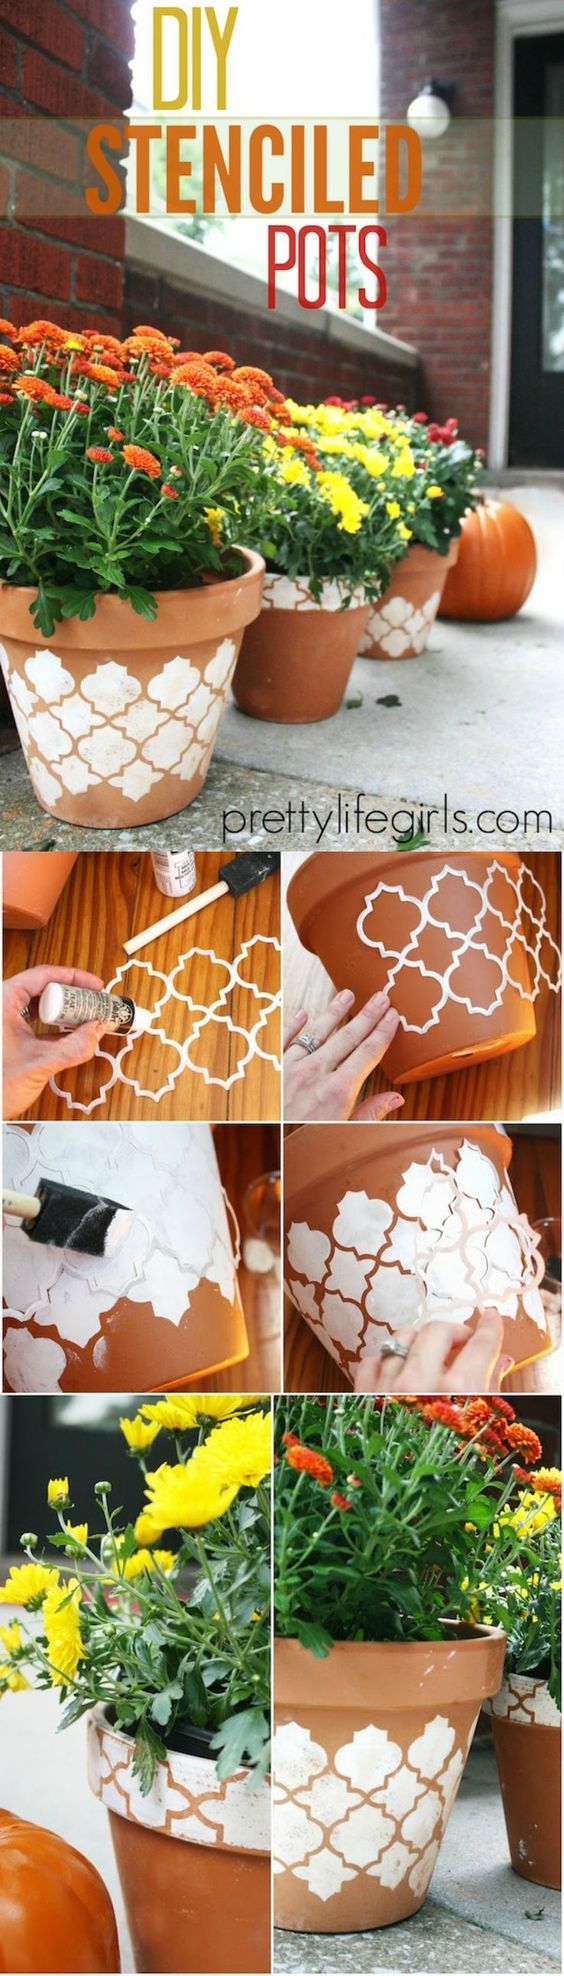 DIY Stenciled Flower Pots